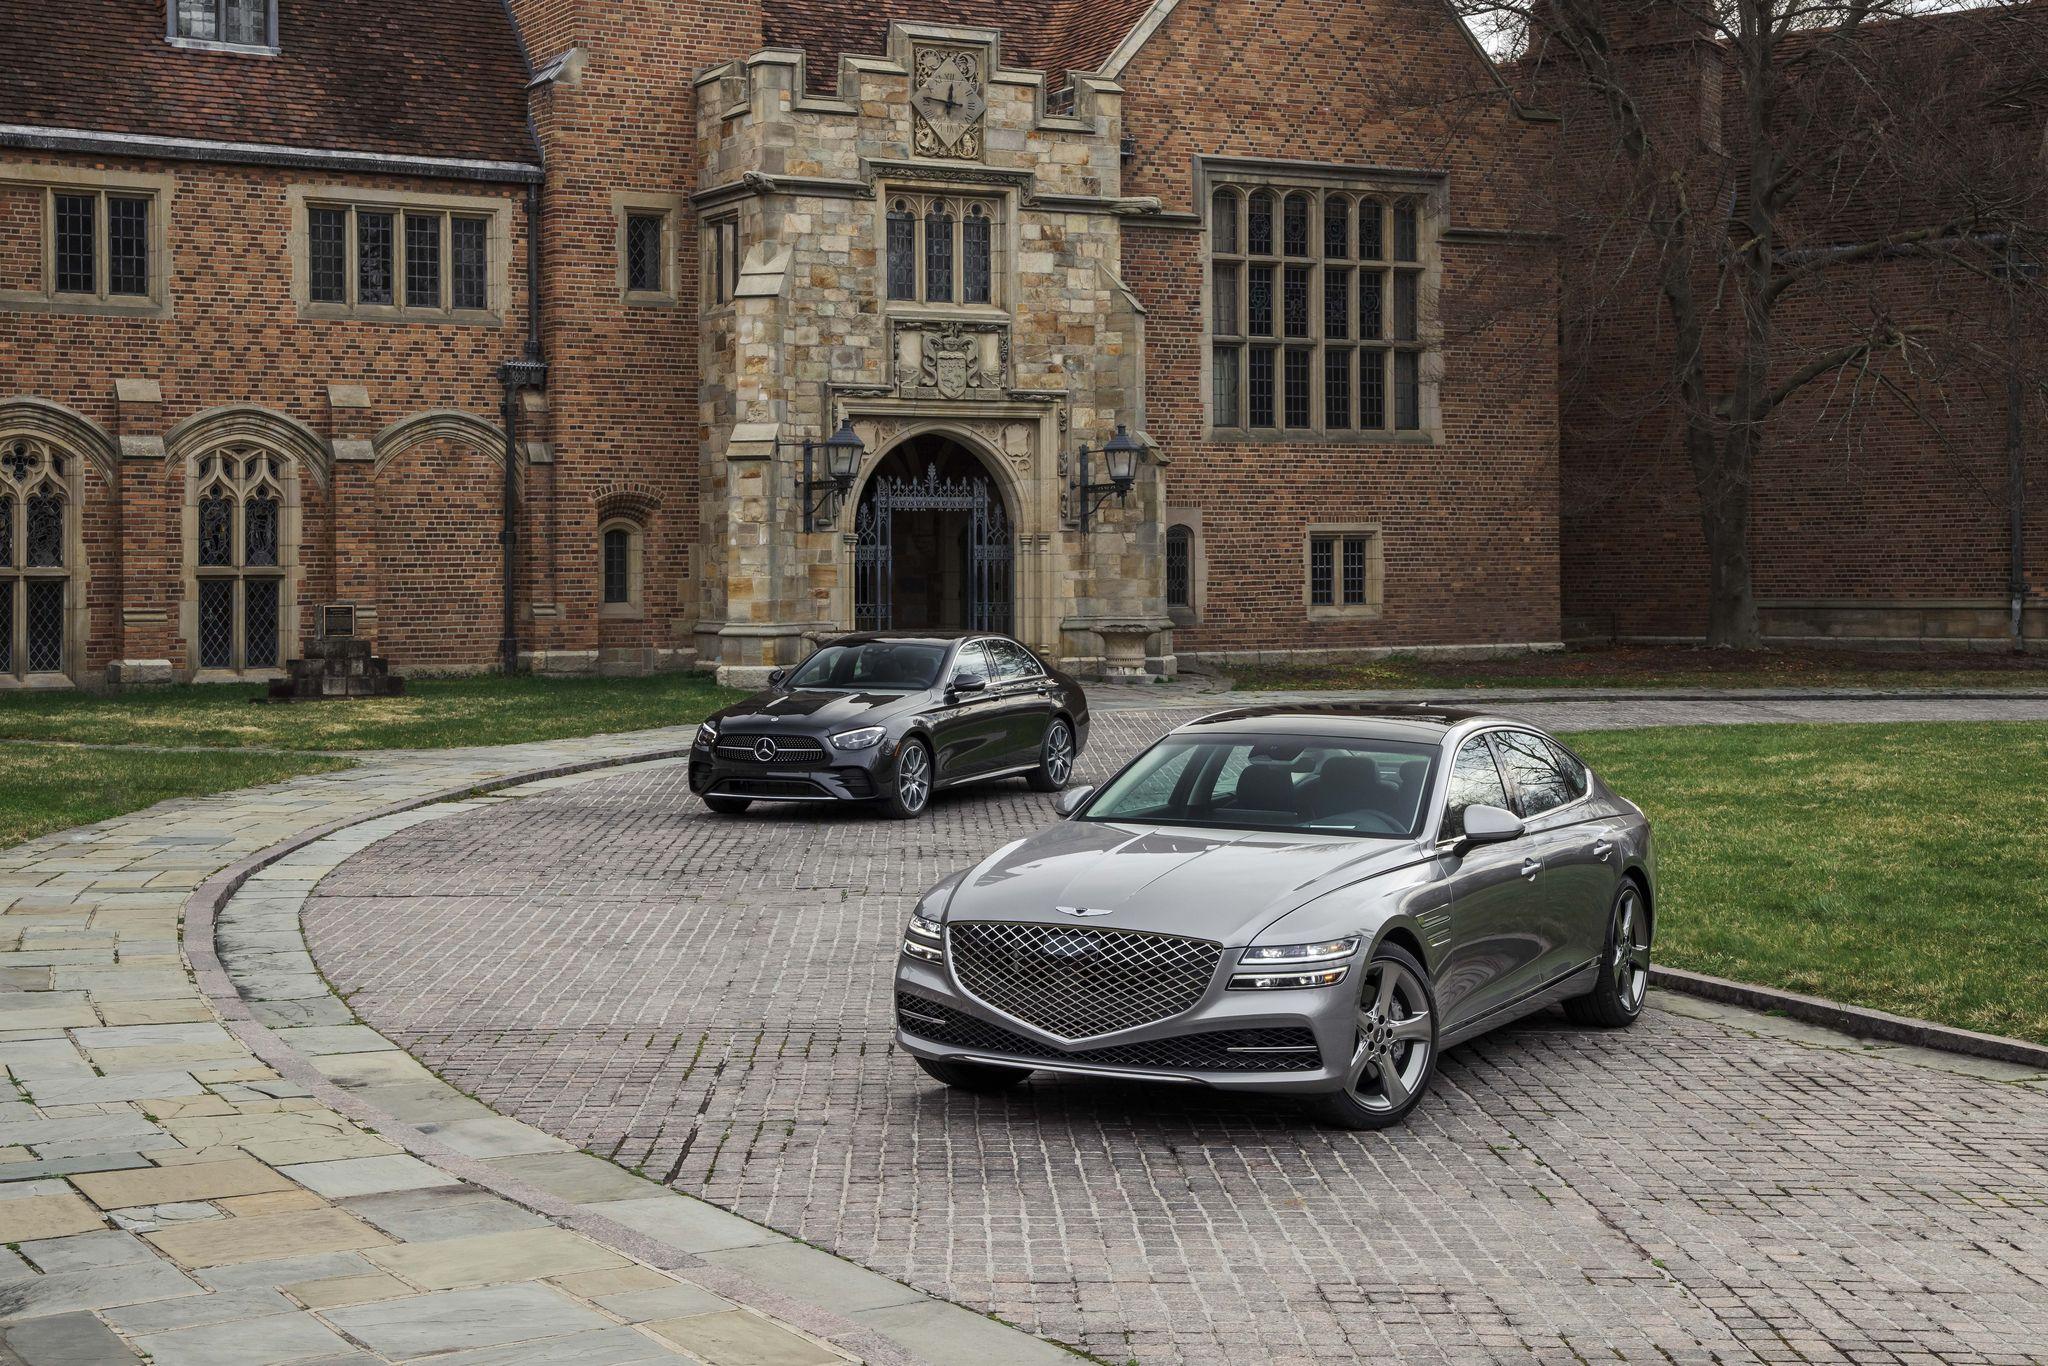 Tested: 2021 Genesis G80 3.5T vs. Mercedes-Benz E450 4Matic